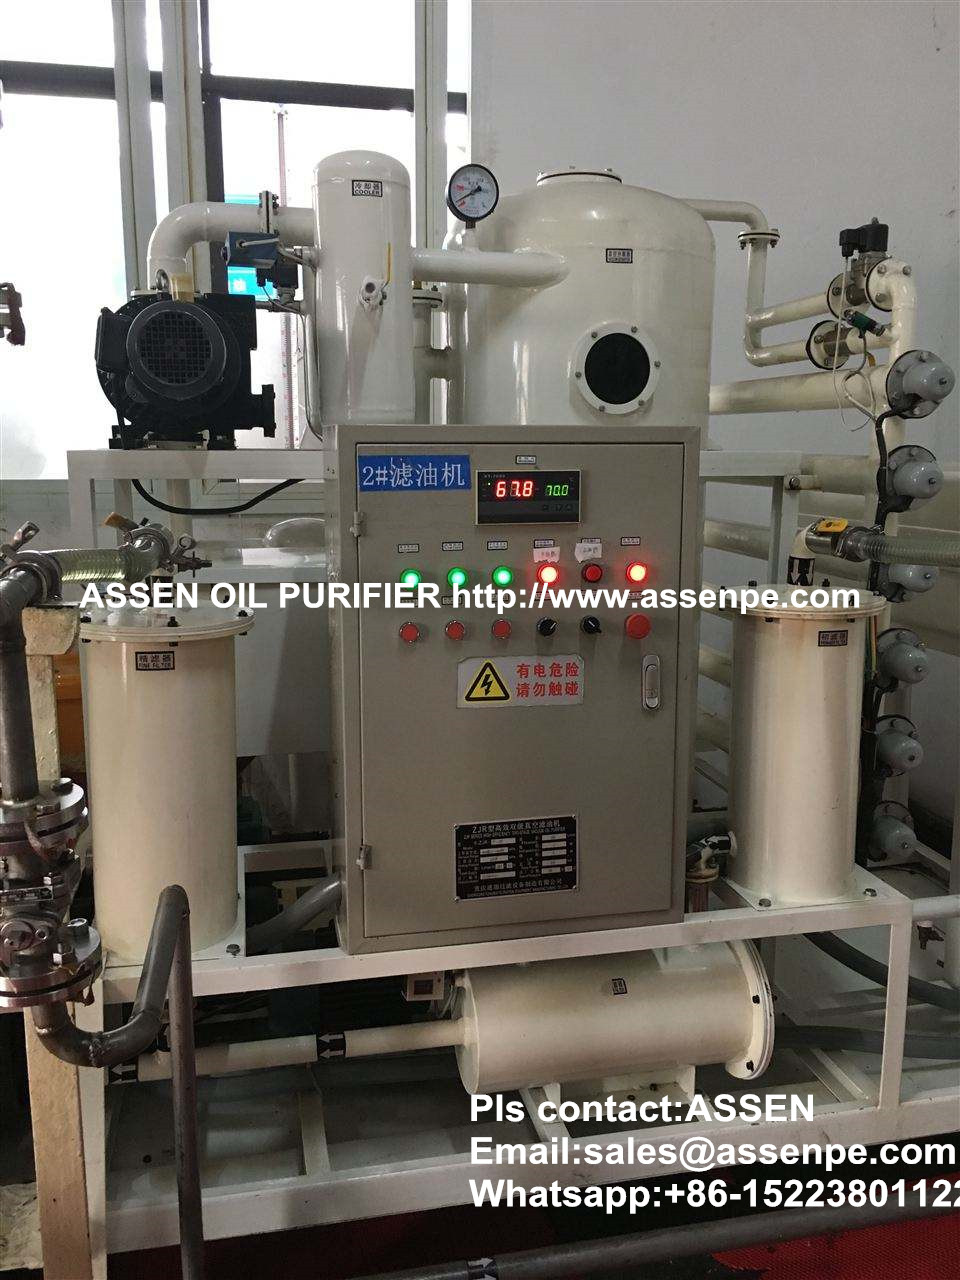 Online dehydration transformer oil purifier plant,insulation oil purification process plant